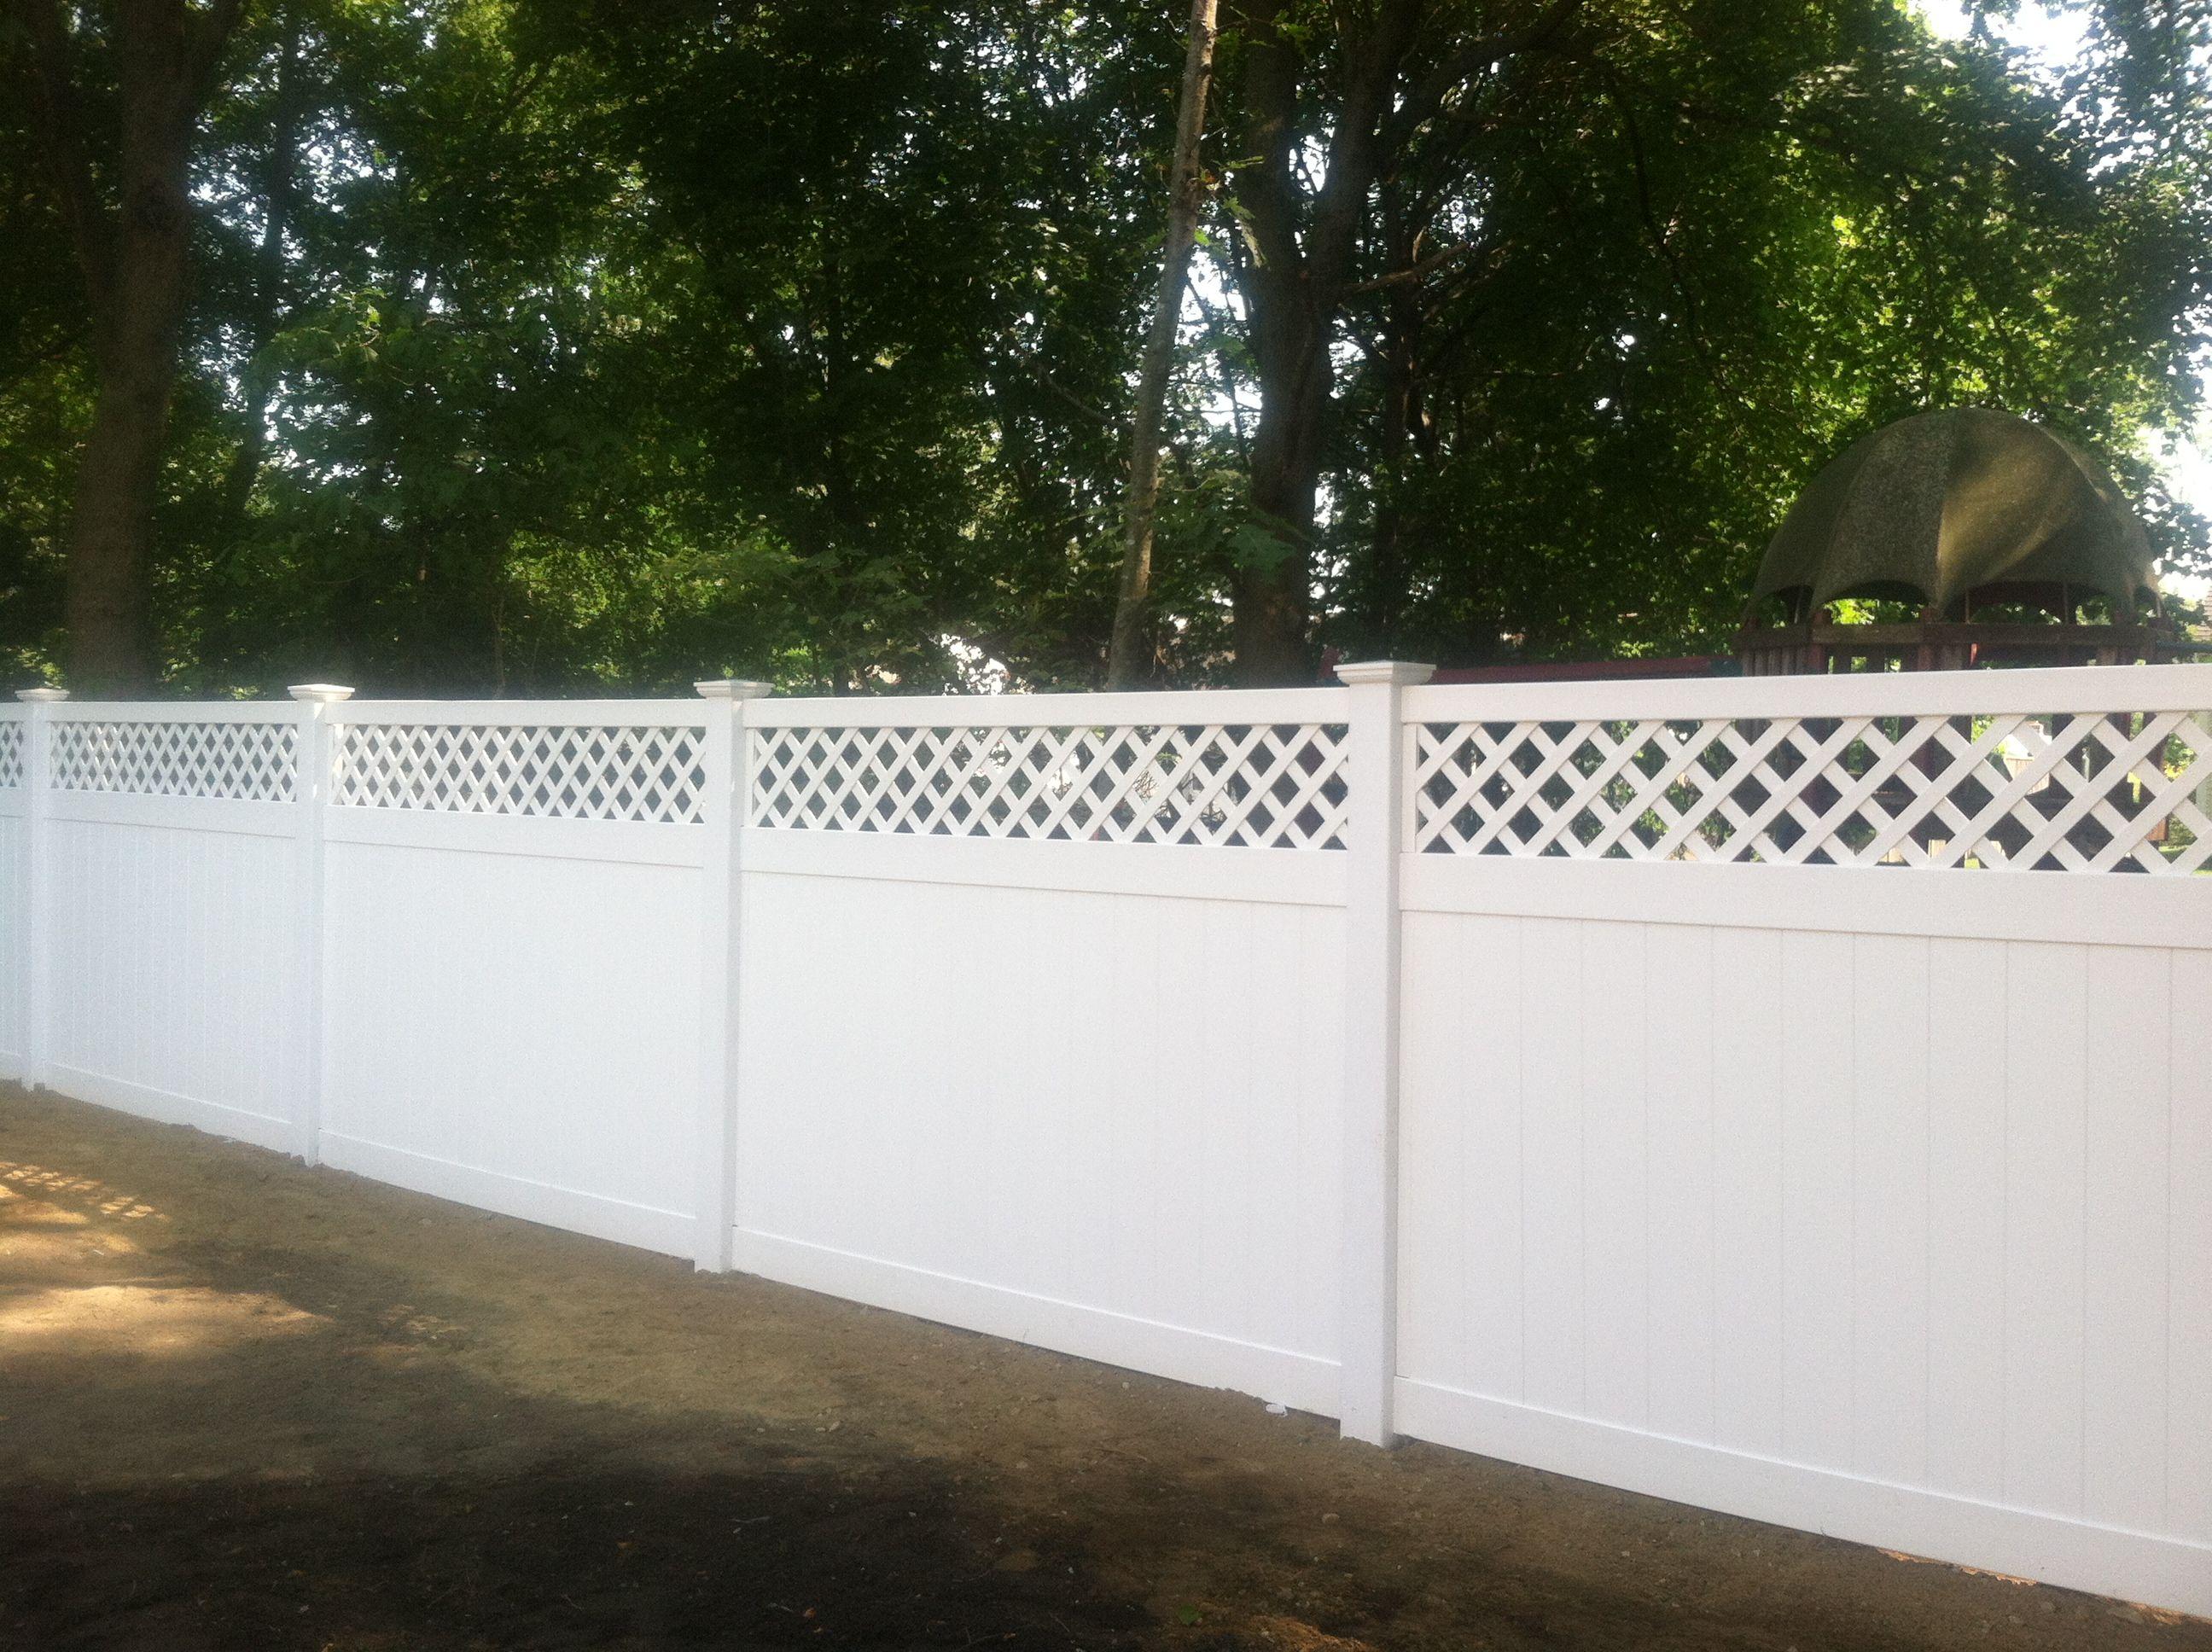 6 High White Pvc Diamond Lattice Top Fence Fence With Lattice Top Lattice Top Lattice